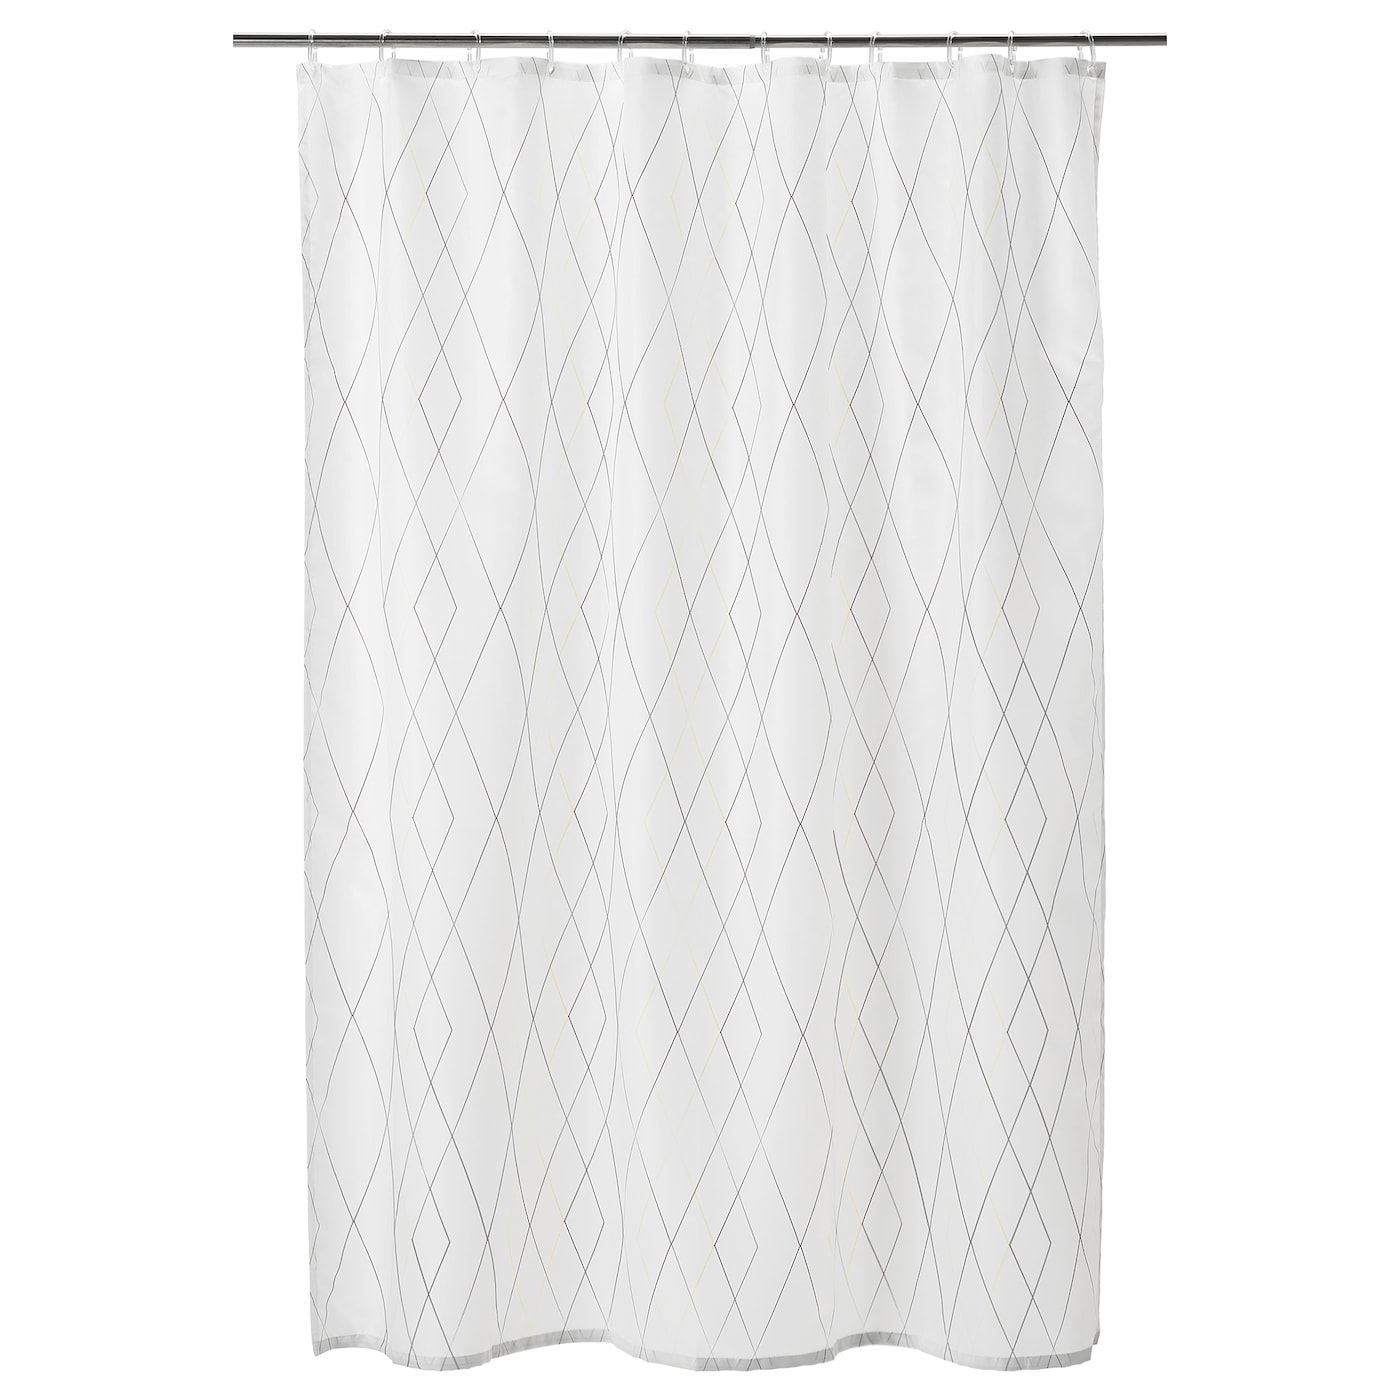 Bastsjon Shower Curtain White Yellow Lilac 71x71 In 2020